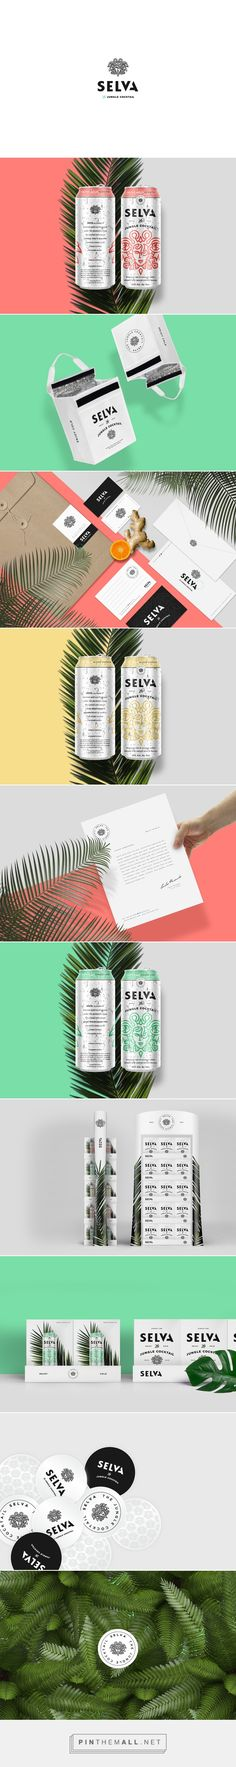 Selva Jungle Cocktail Packaging on Behance | Fivestar Branding – Design and Branding Agency & Inspiration Gallery